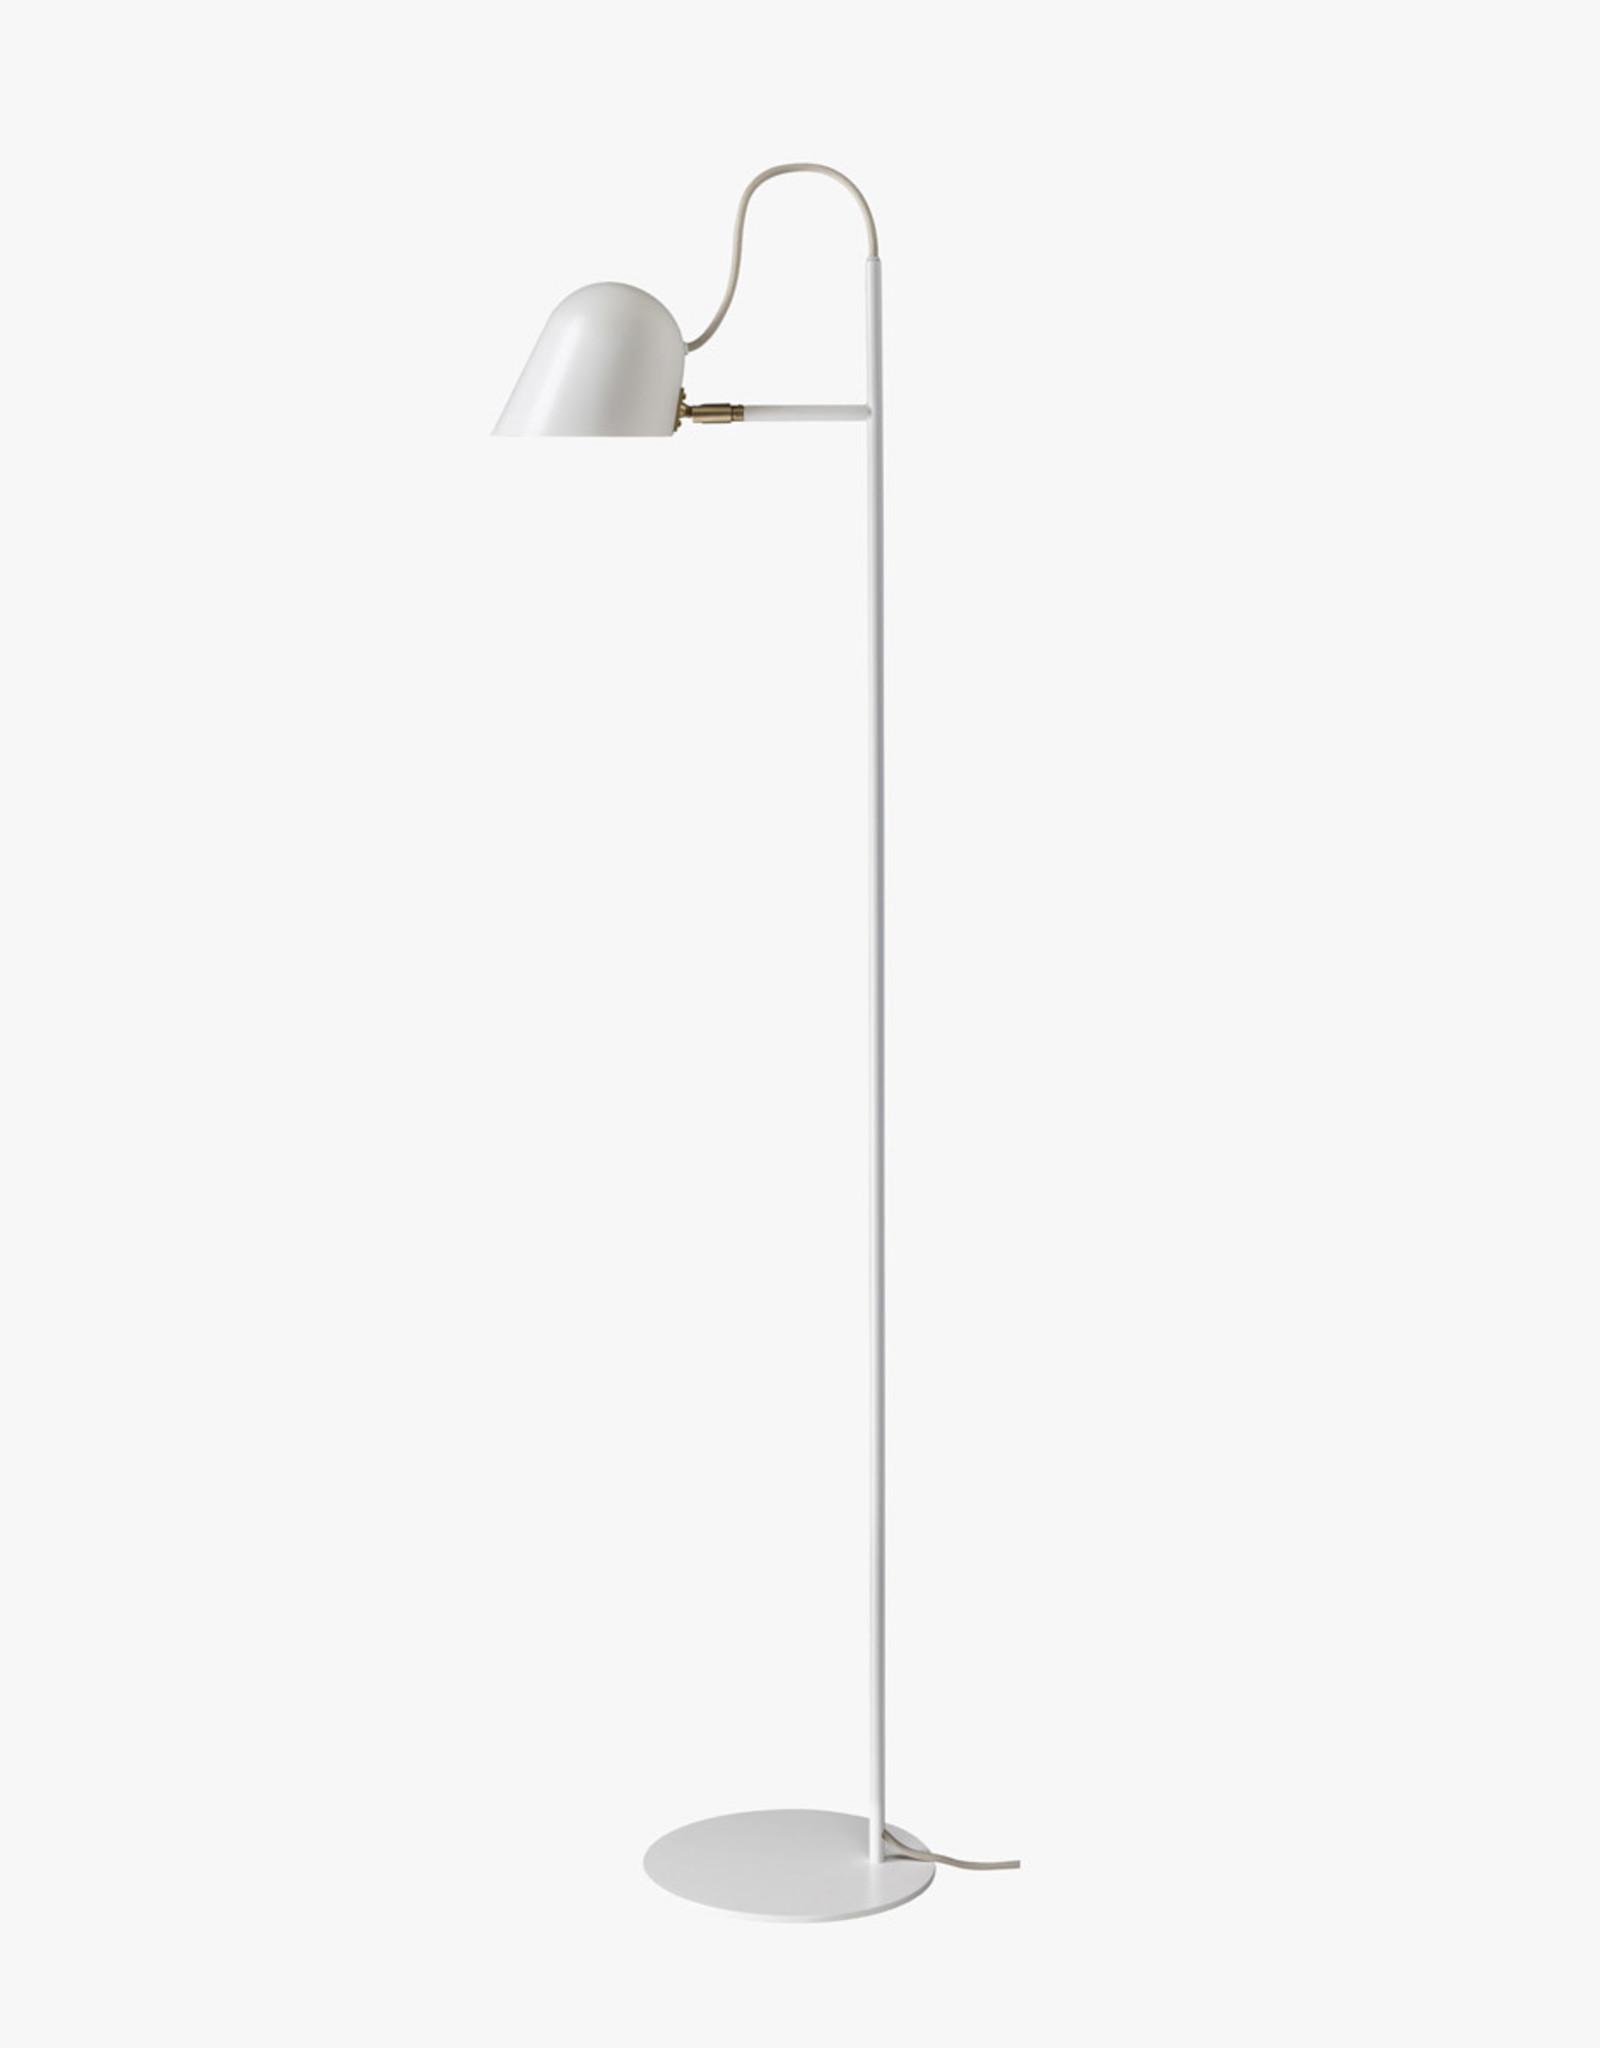 Streck floor light by Joel Karlsson   White/brass   W36.5cm x H135.5cm   Integrated 6W LED